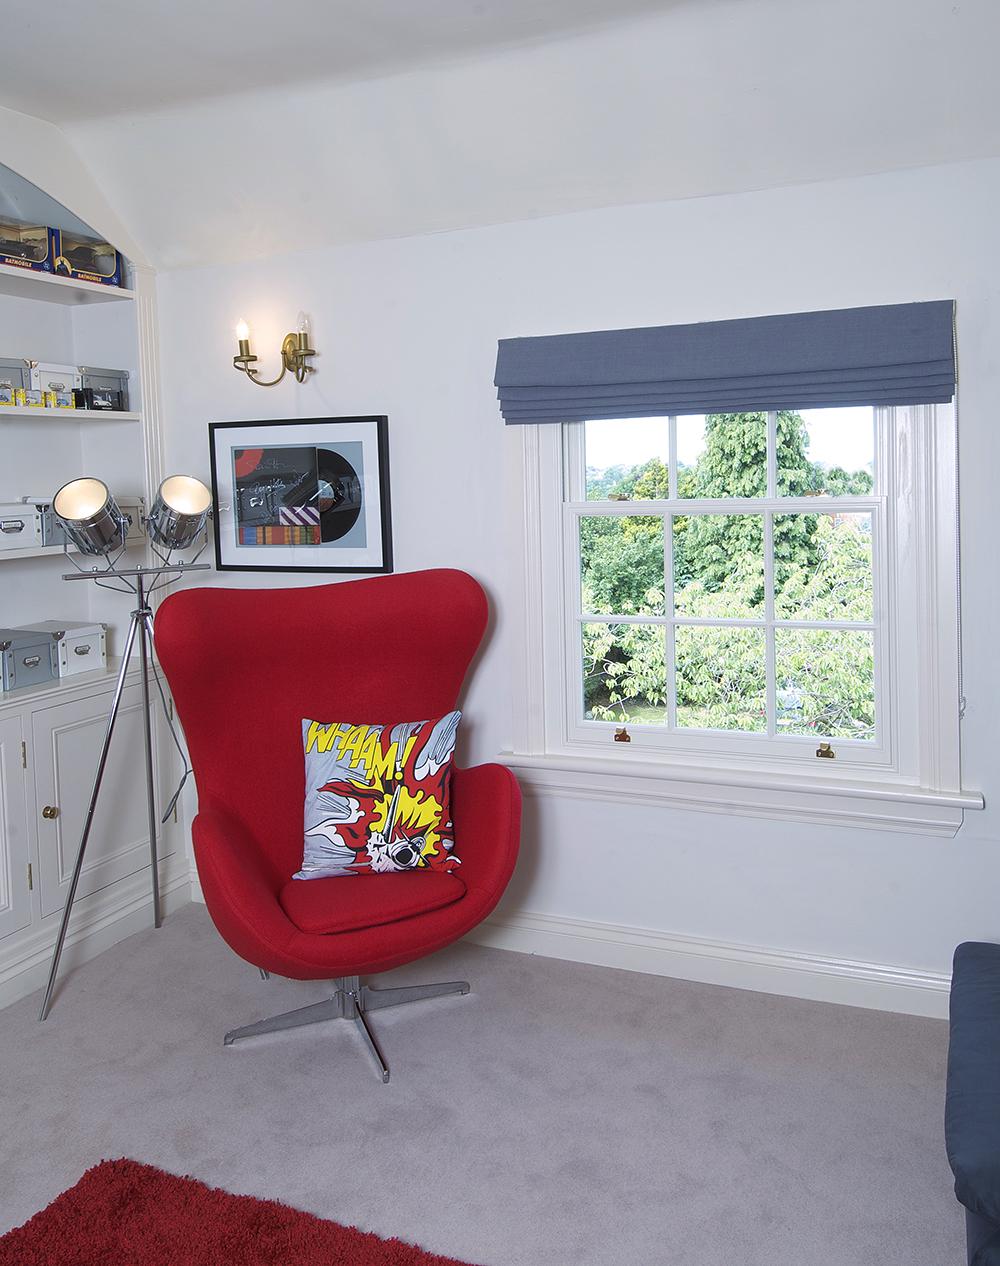 Denton Wolverhampton internal sash window